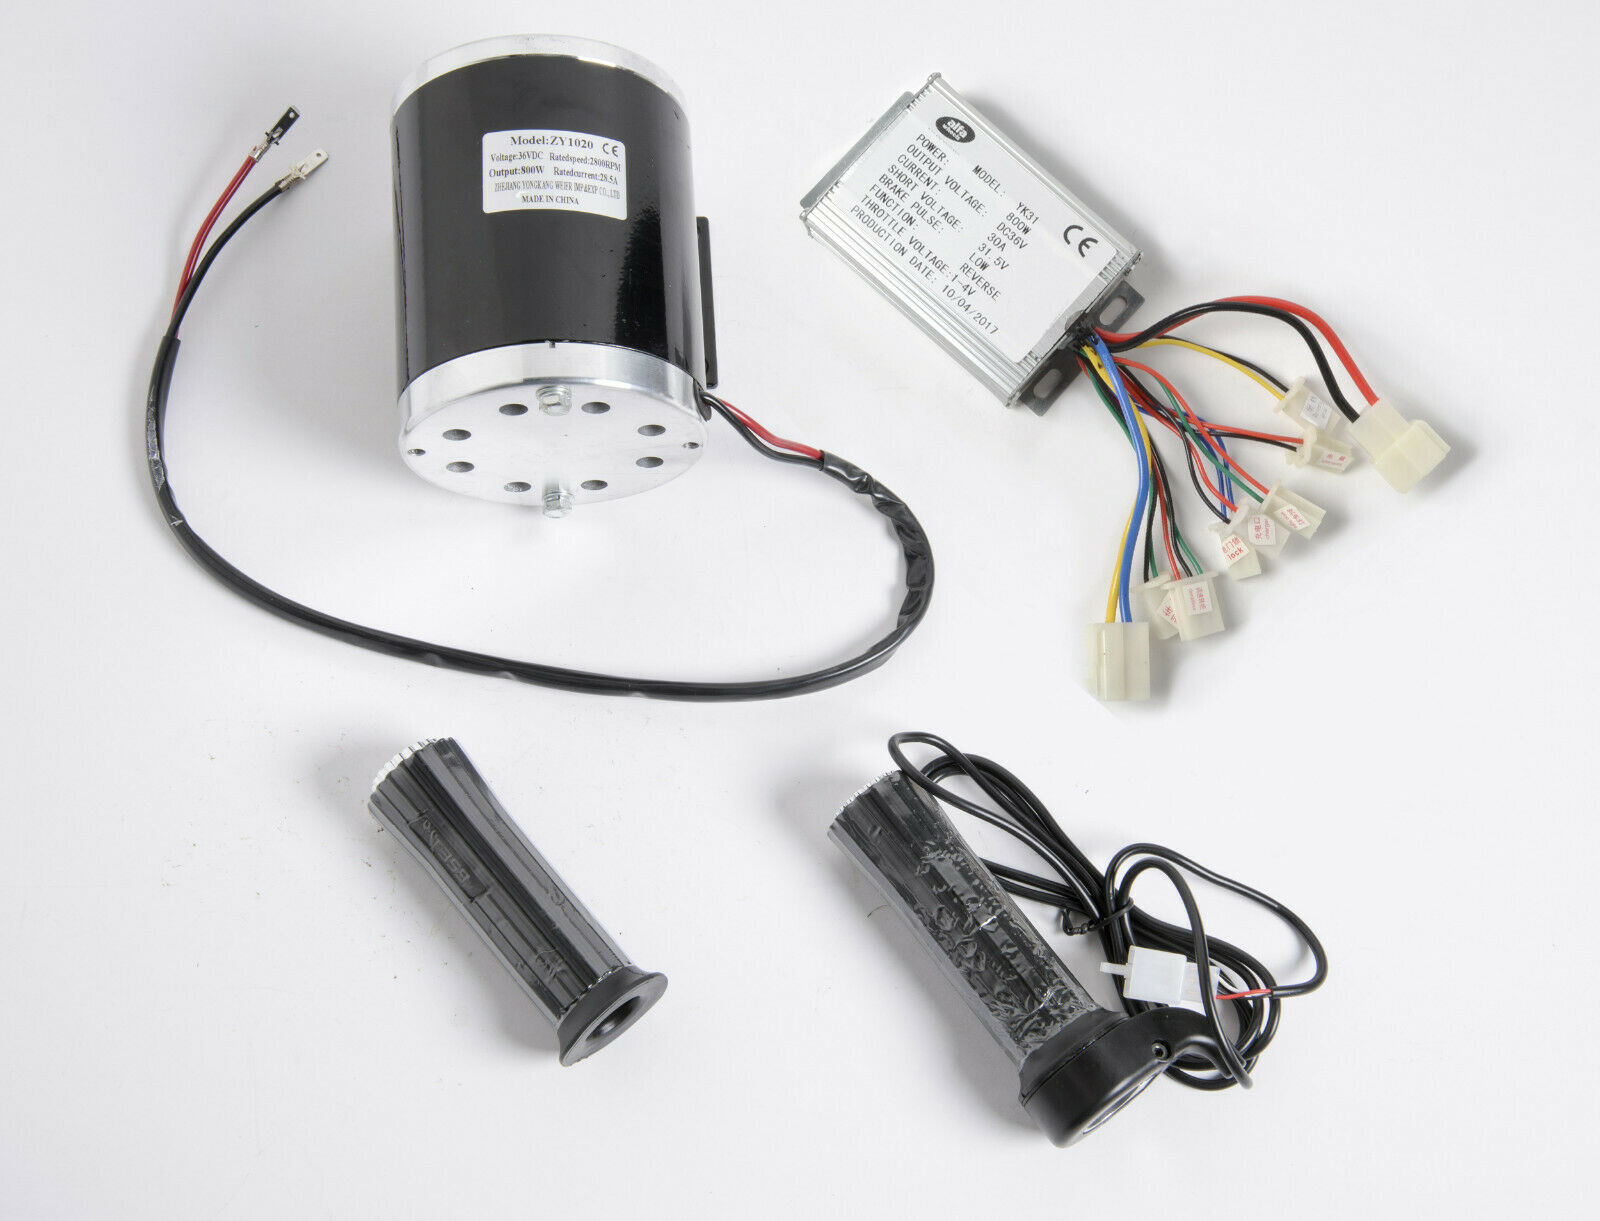 800 Watt 36 Volt electric motor kit w base speed control w Reverse & Thredtle